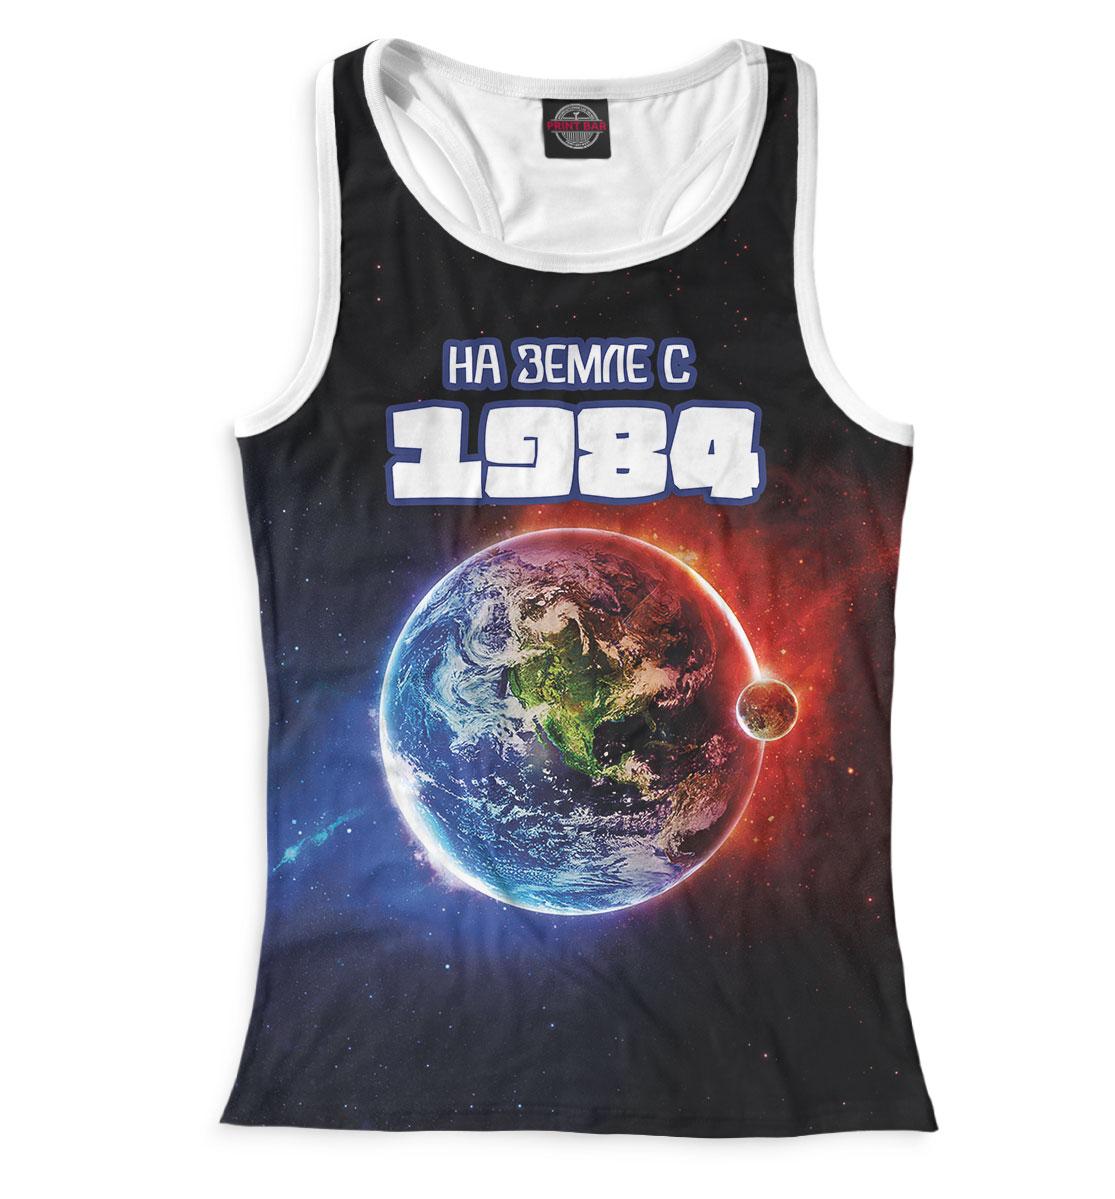 На Земле с 1984, Printbar, Майки борцовки, DVC-448876-mayb-1  - купить со скидкой